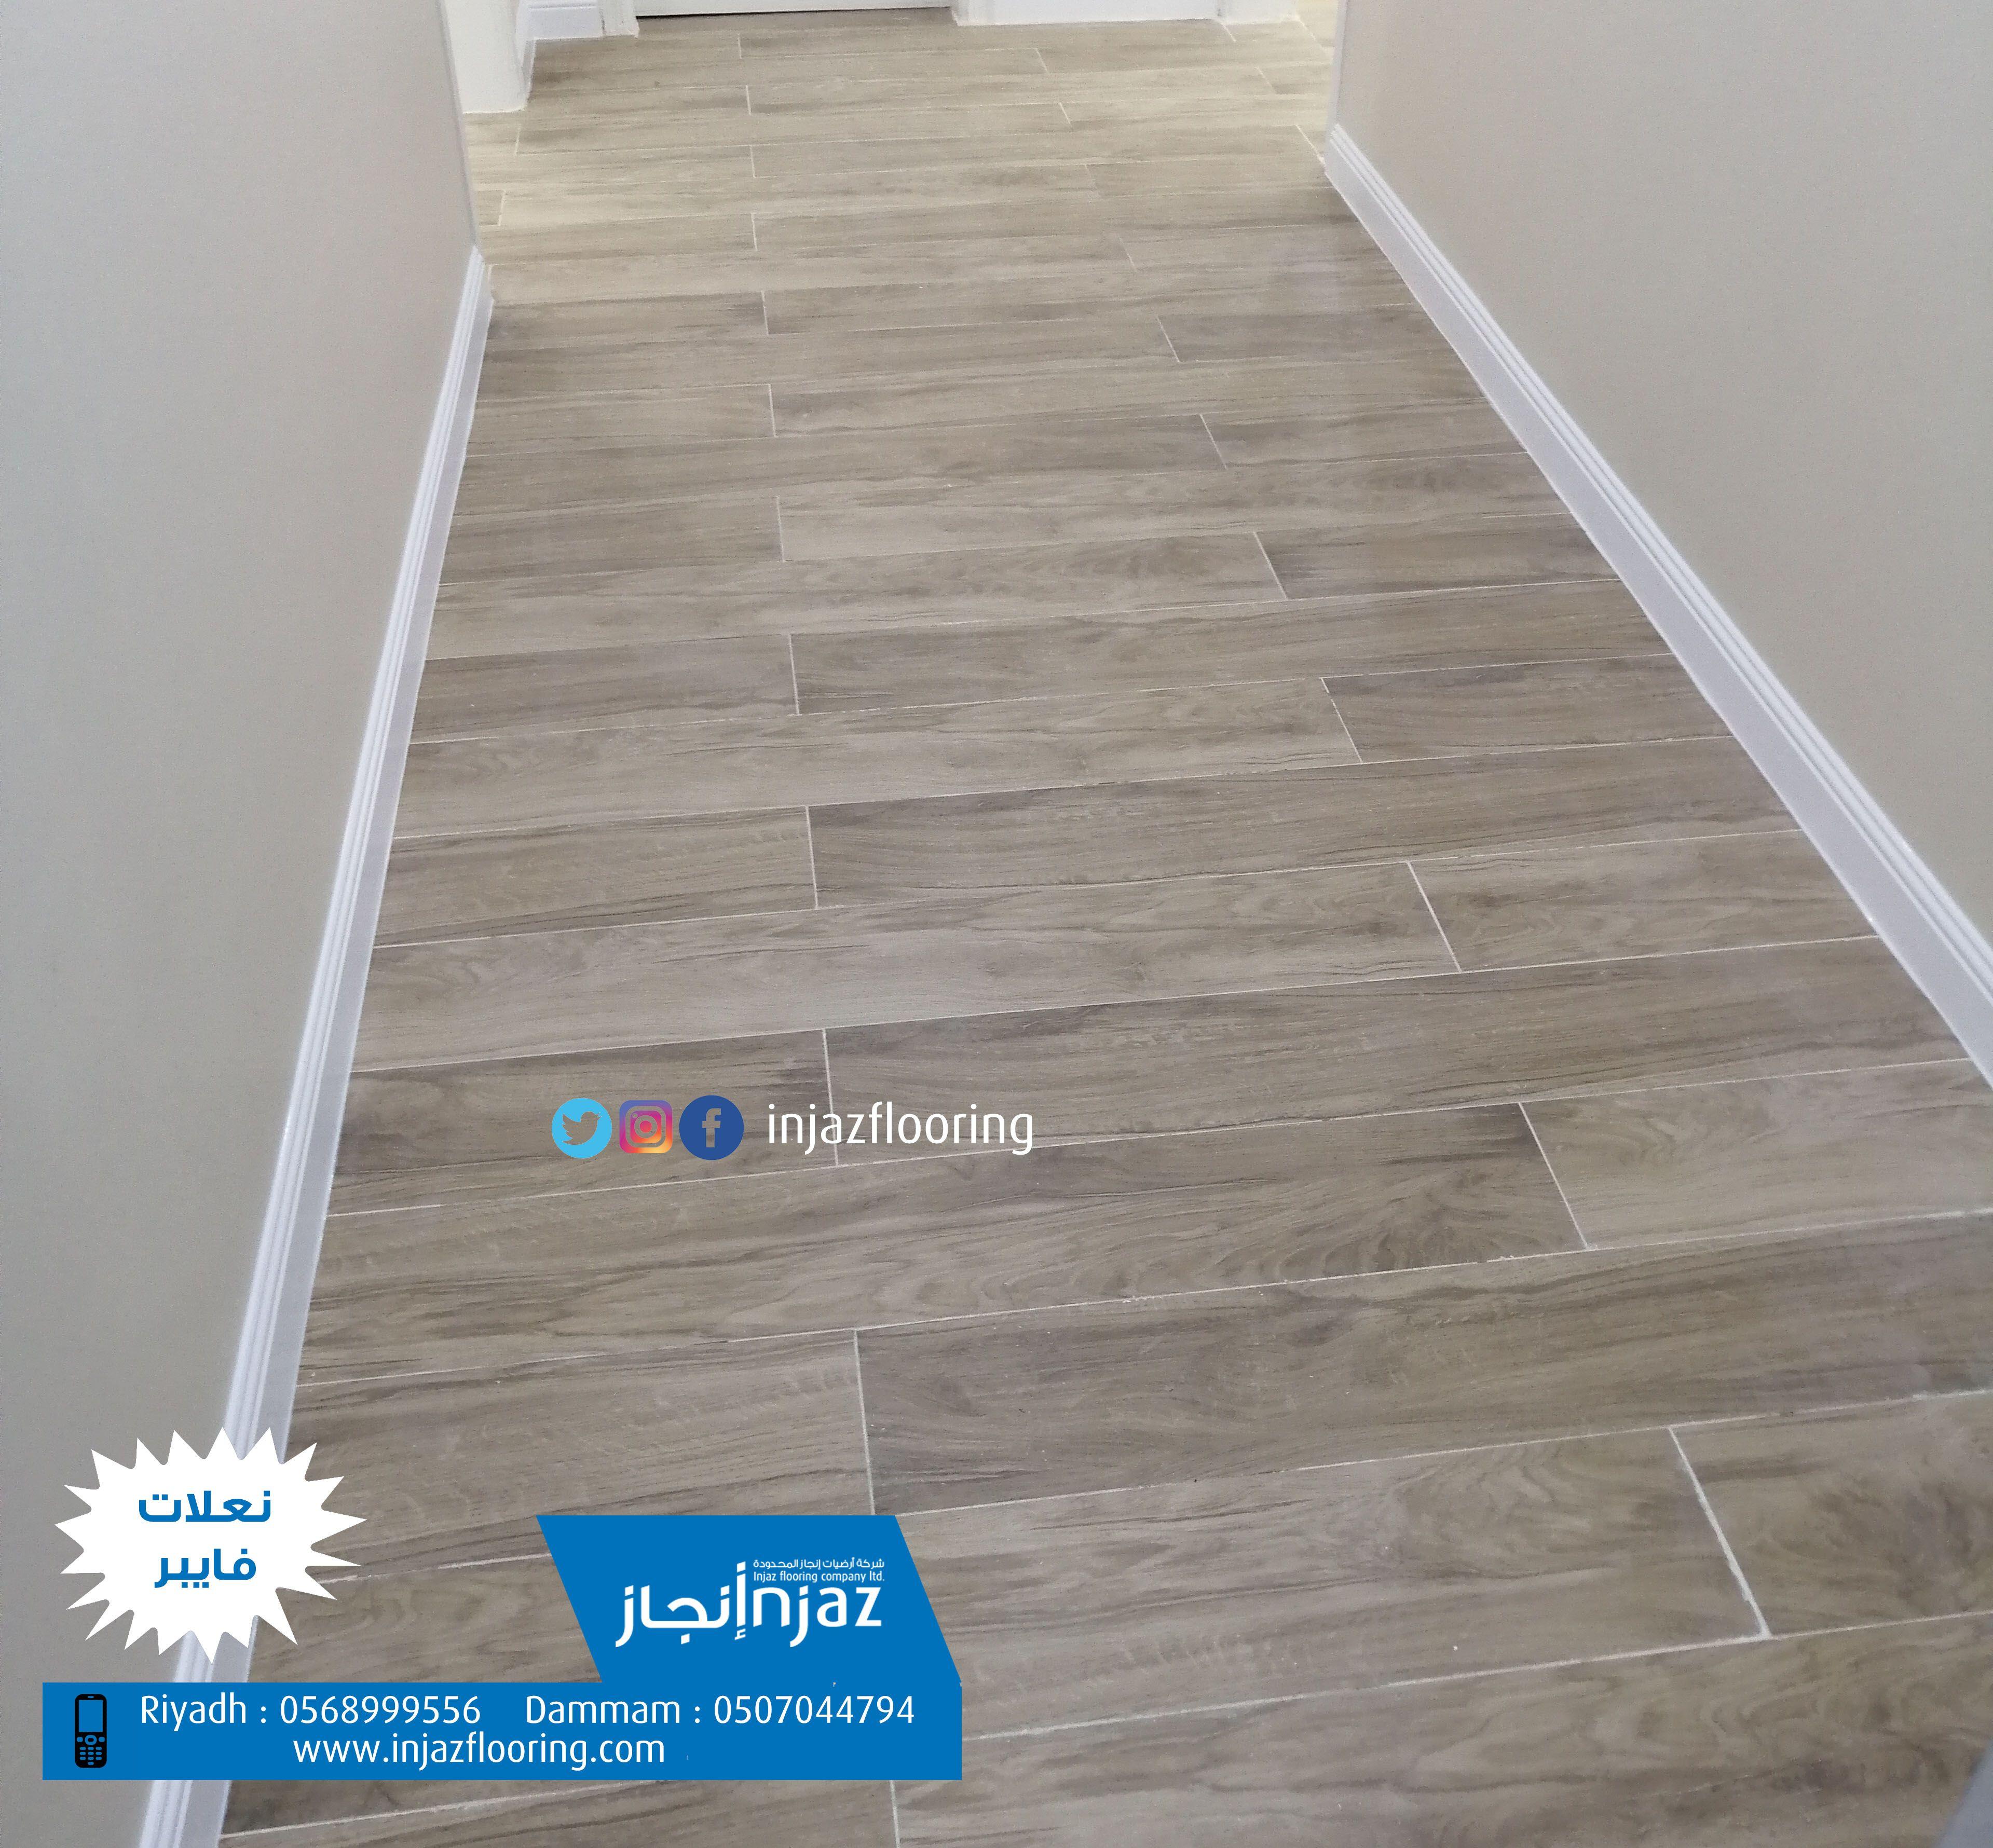 نعلات فايبر انجاز نعلات فوم Flooring Tile Floor Crafts